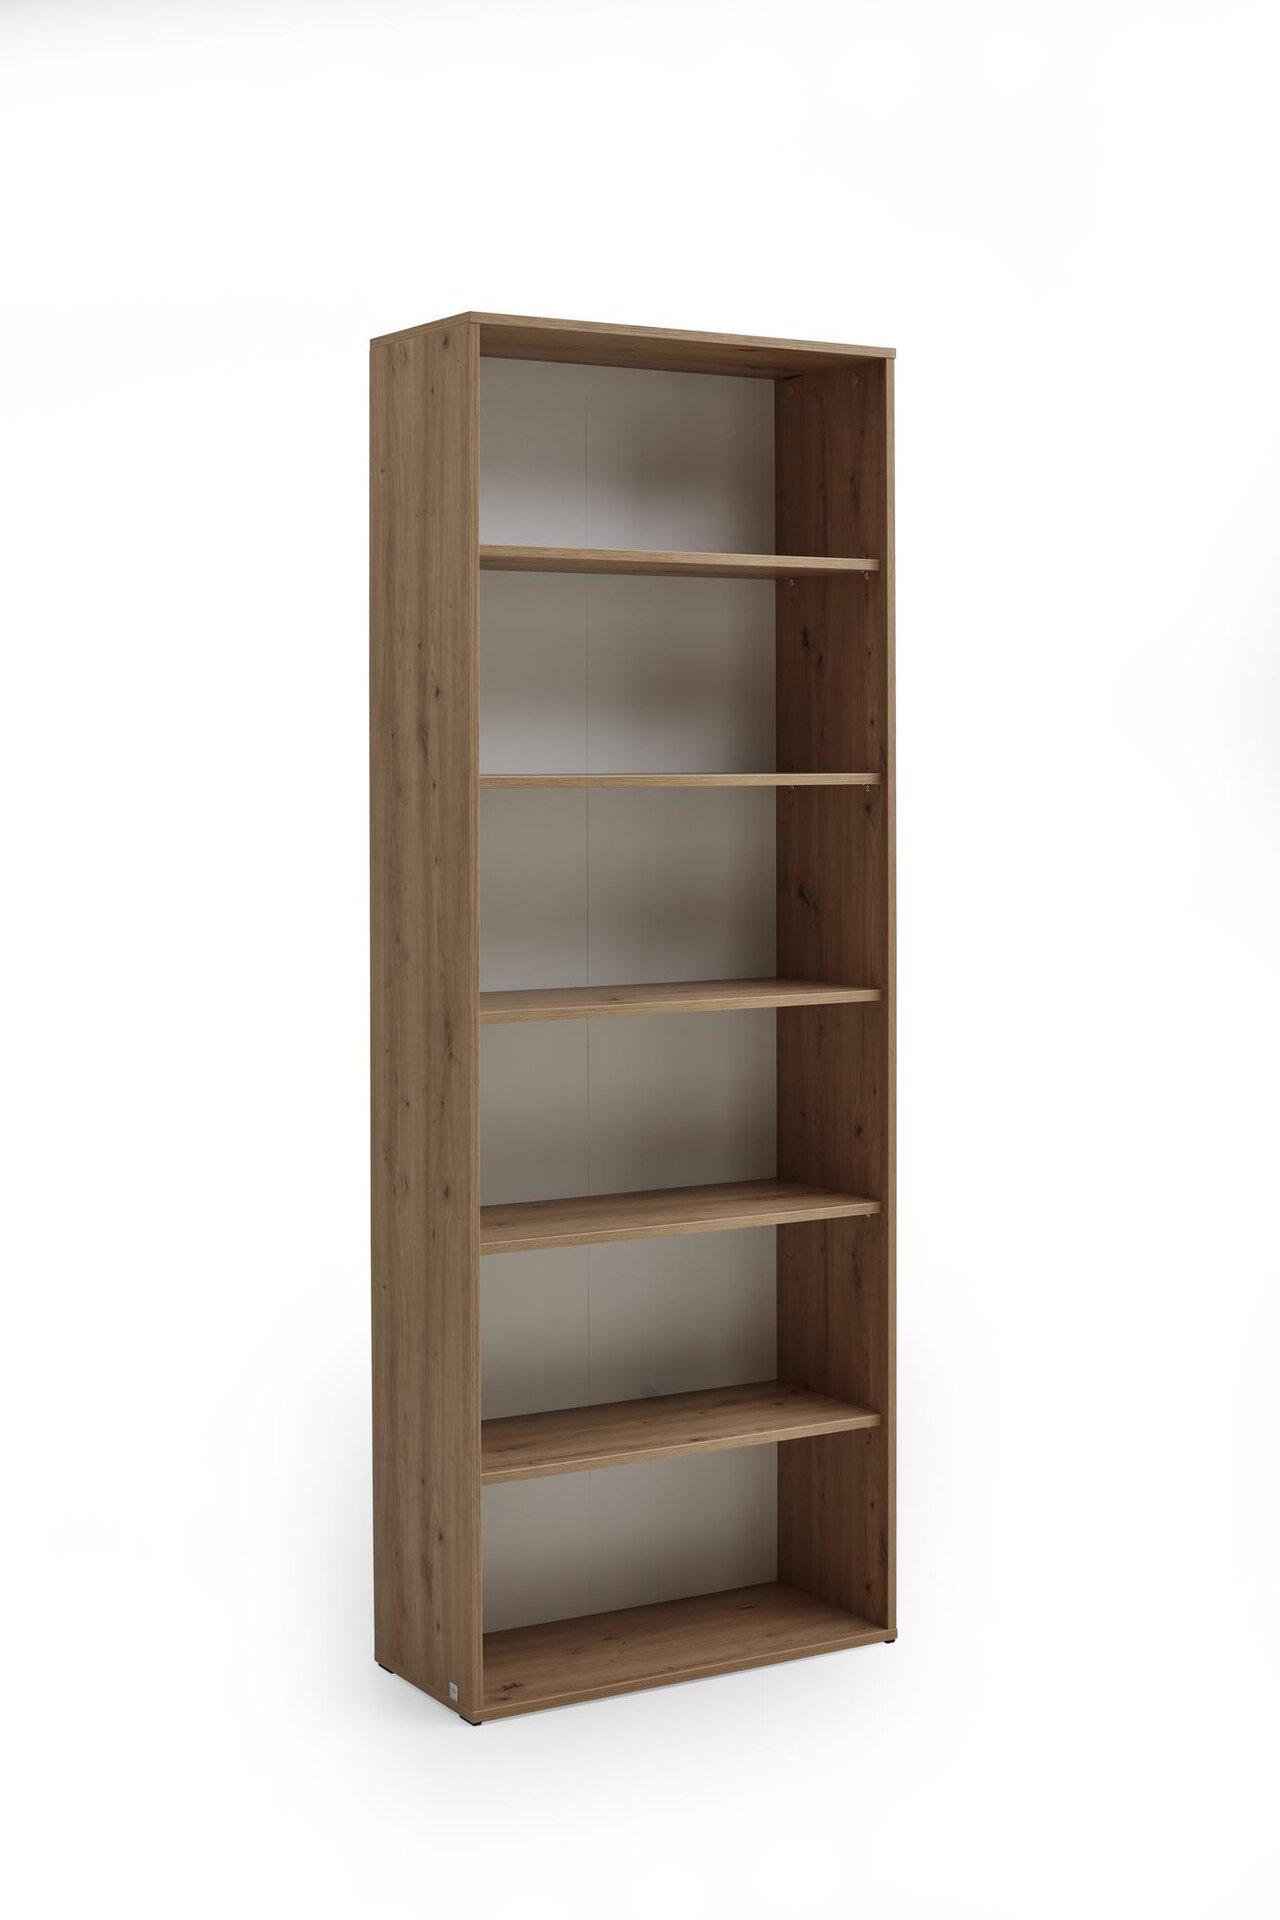 Regal PRONTO Vito Vito Holzwerkstoff braun 35 x 216 x 80 cm